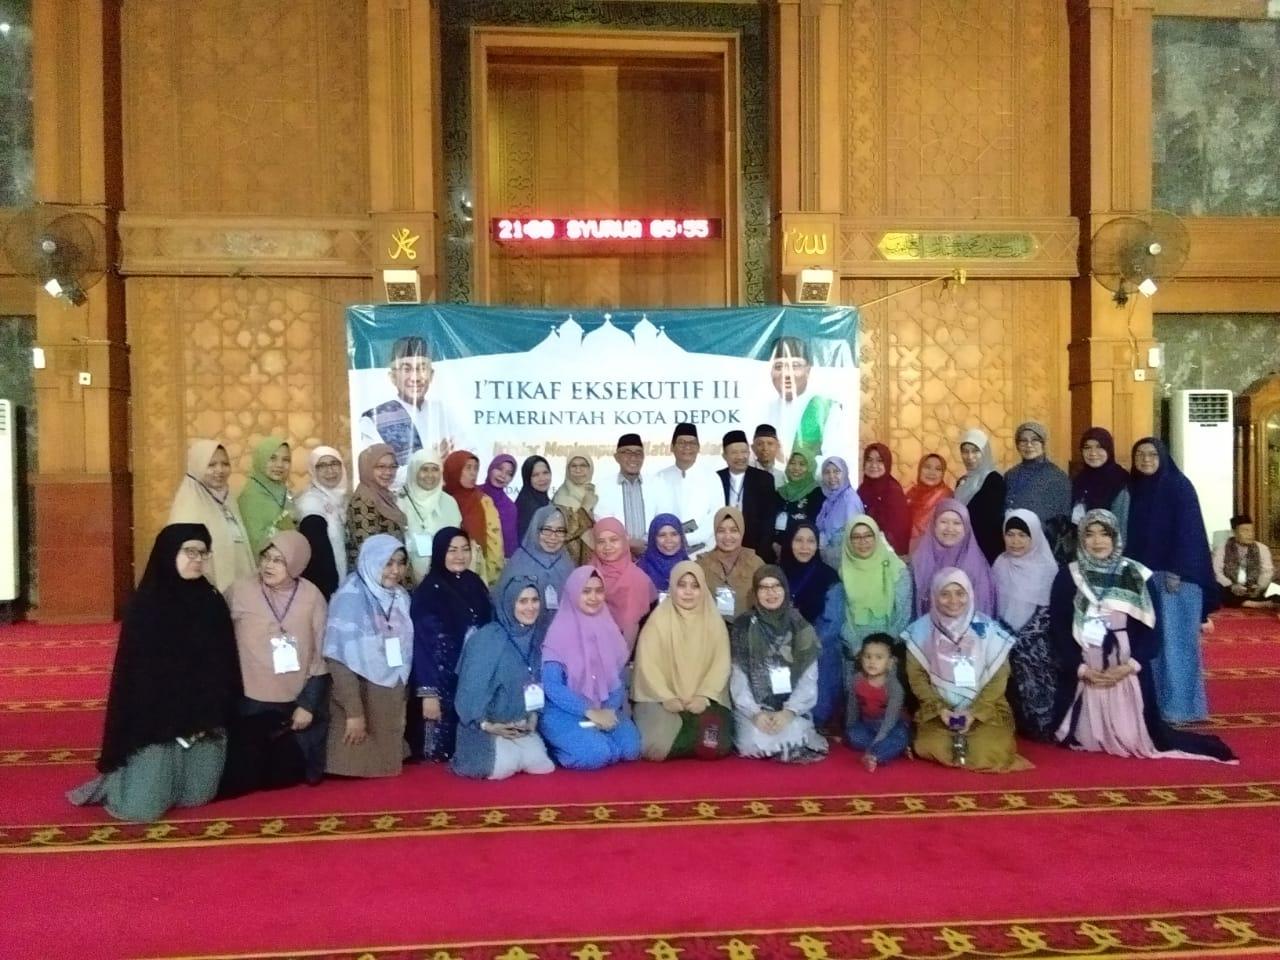 Luar Biasa I'tikaf ASN Depok 40 Menit Khatam Al Qur'an